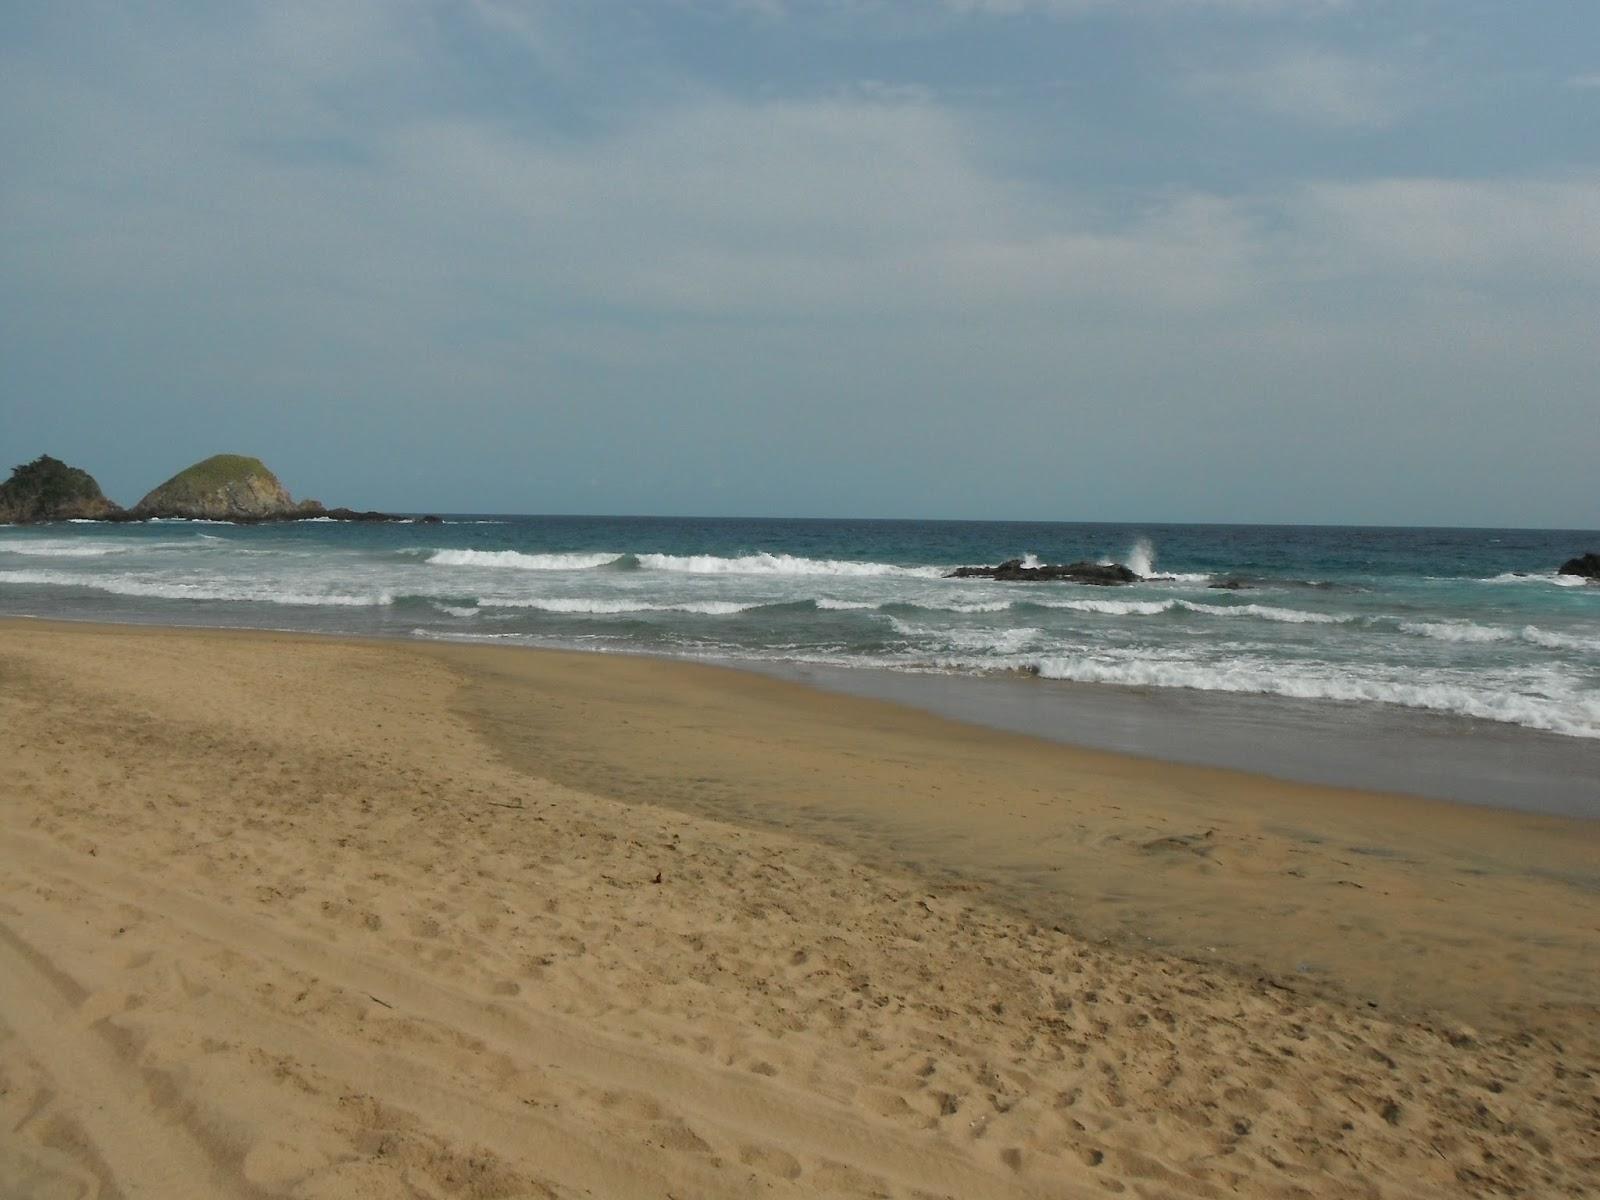 Ecoturismo m xico playa zipolite oaxaca for En zacatecas hay playa